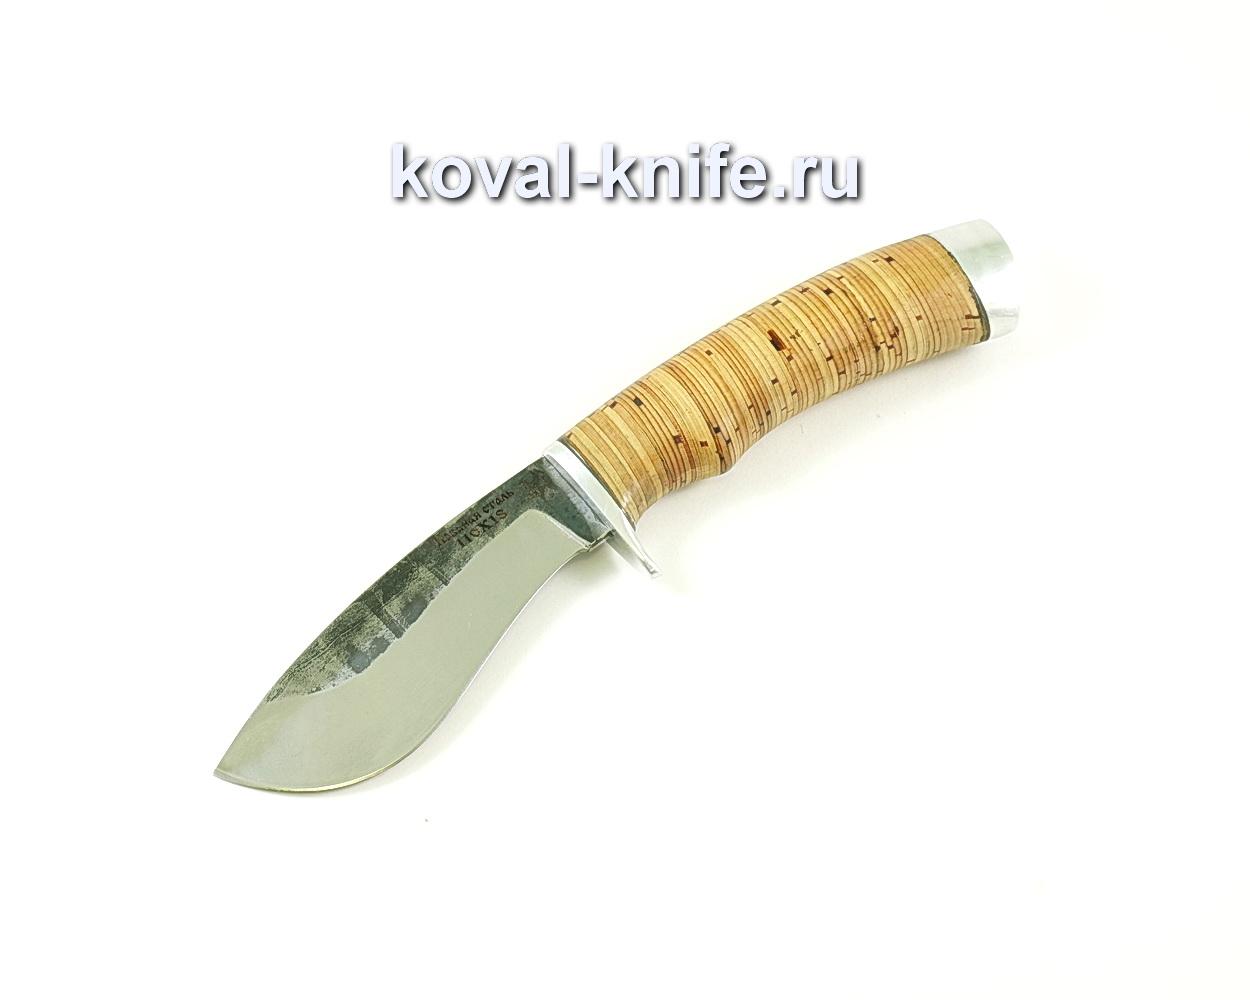 Нож Носорог (сталь 110х18), рукоять береста A036